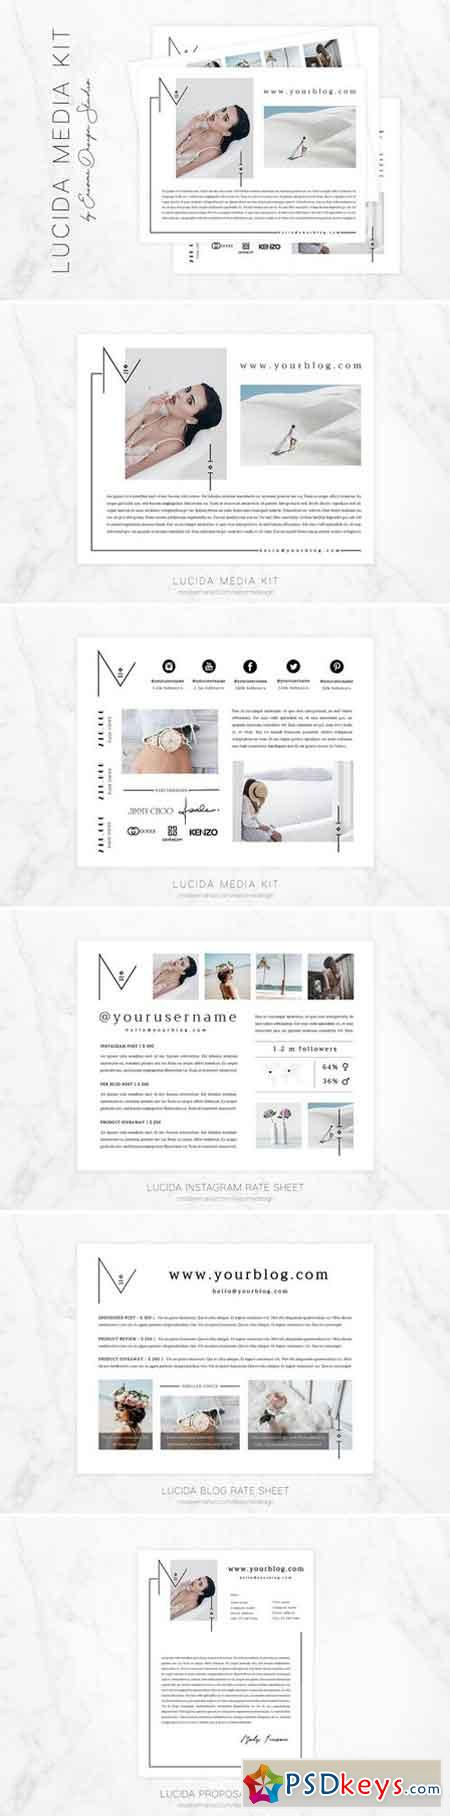 Media Kit Template 2057796